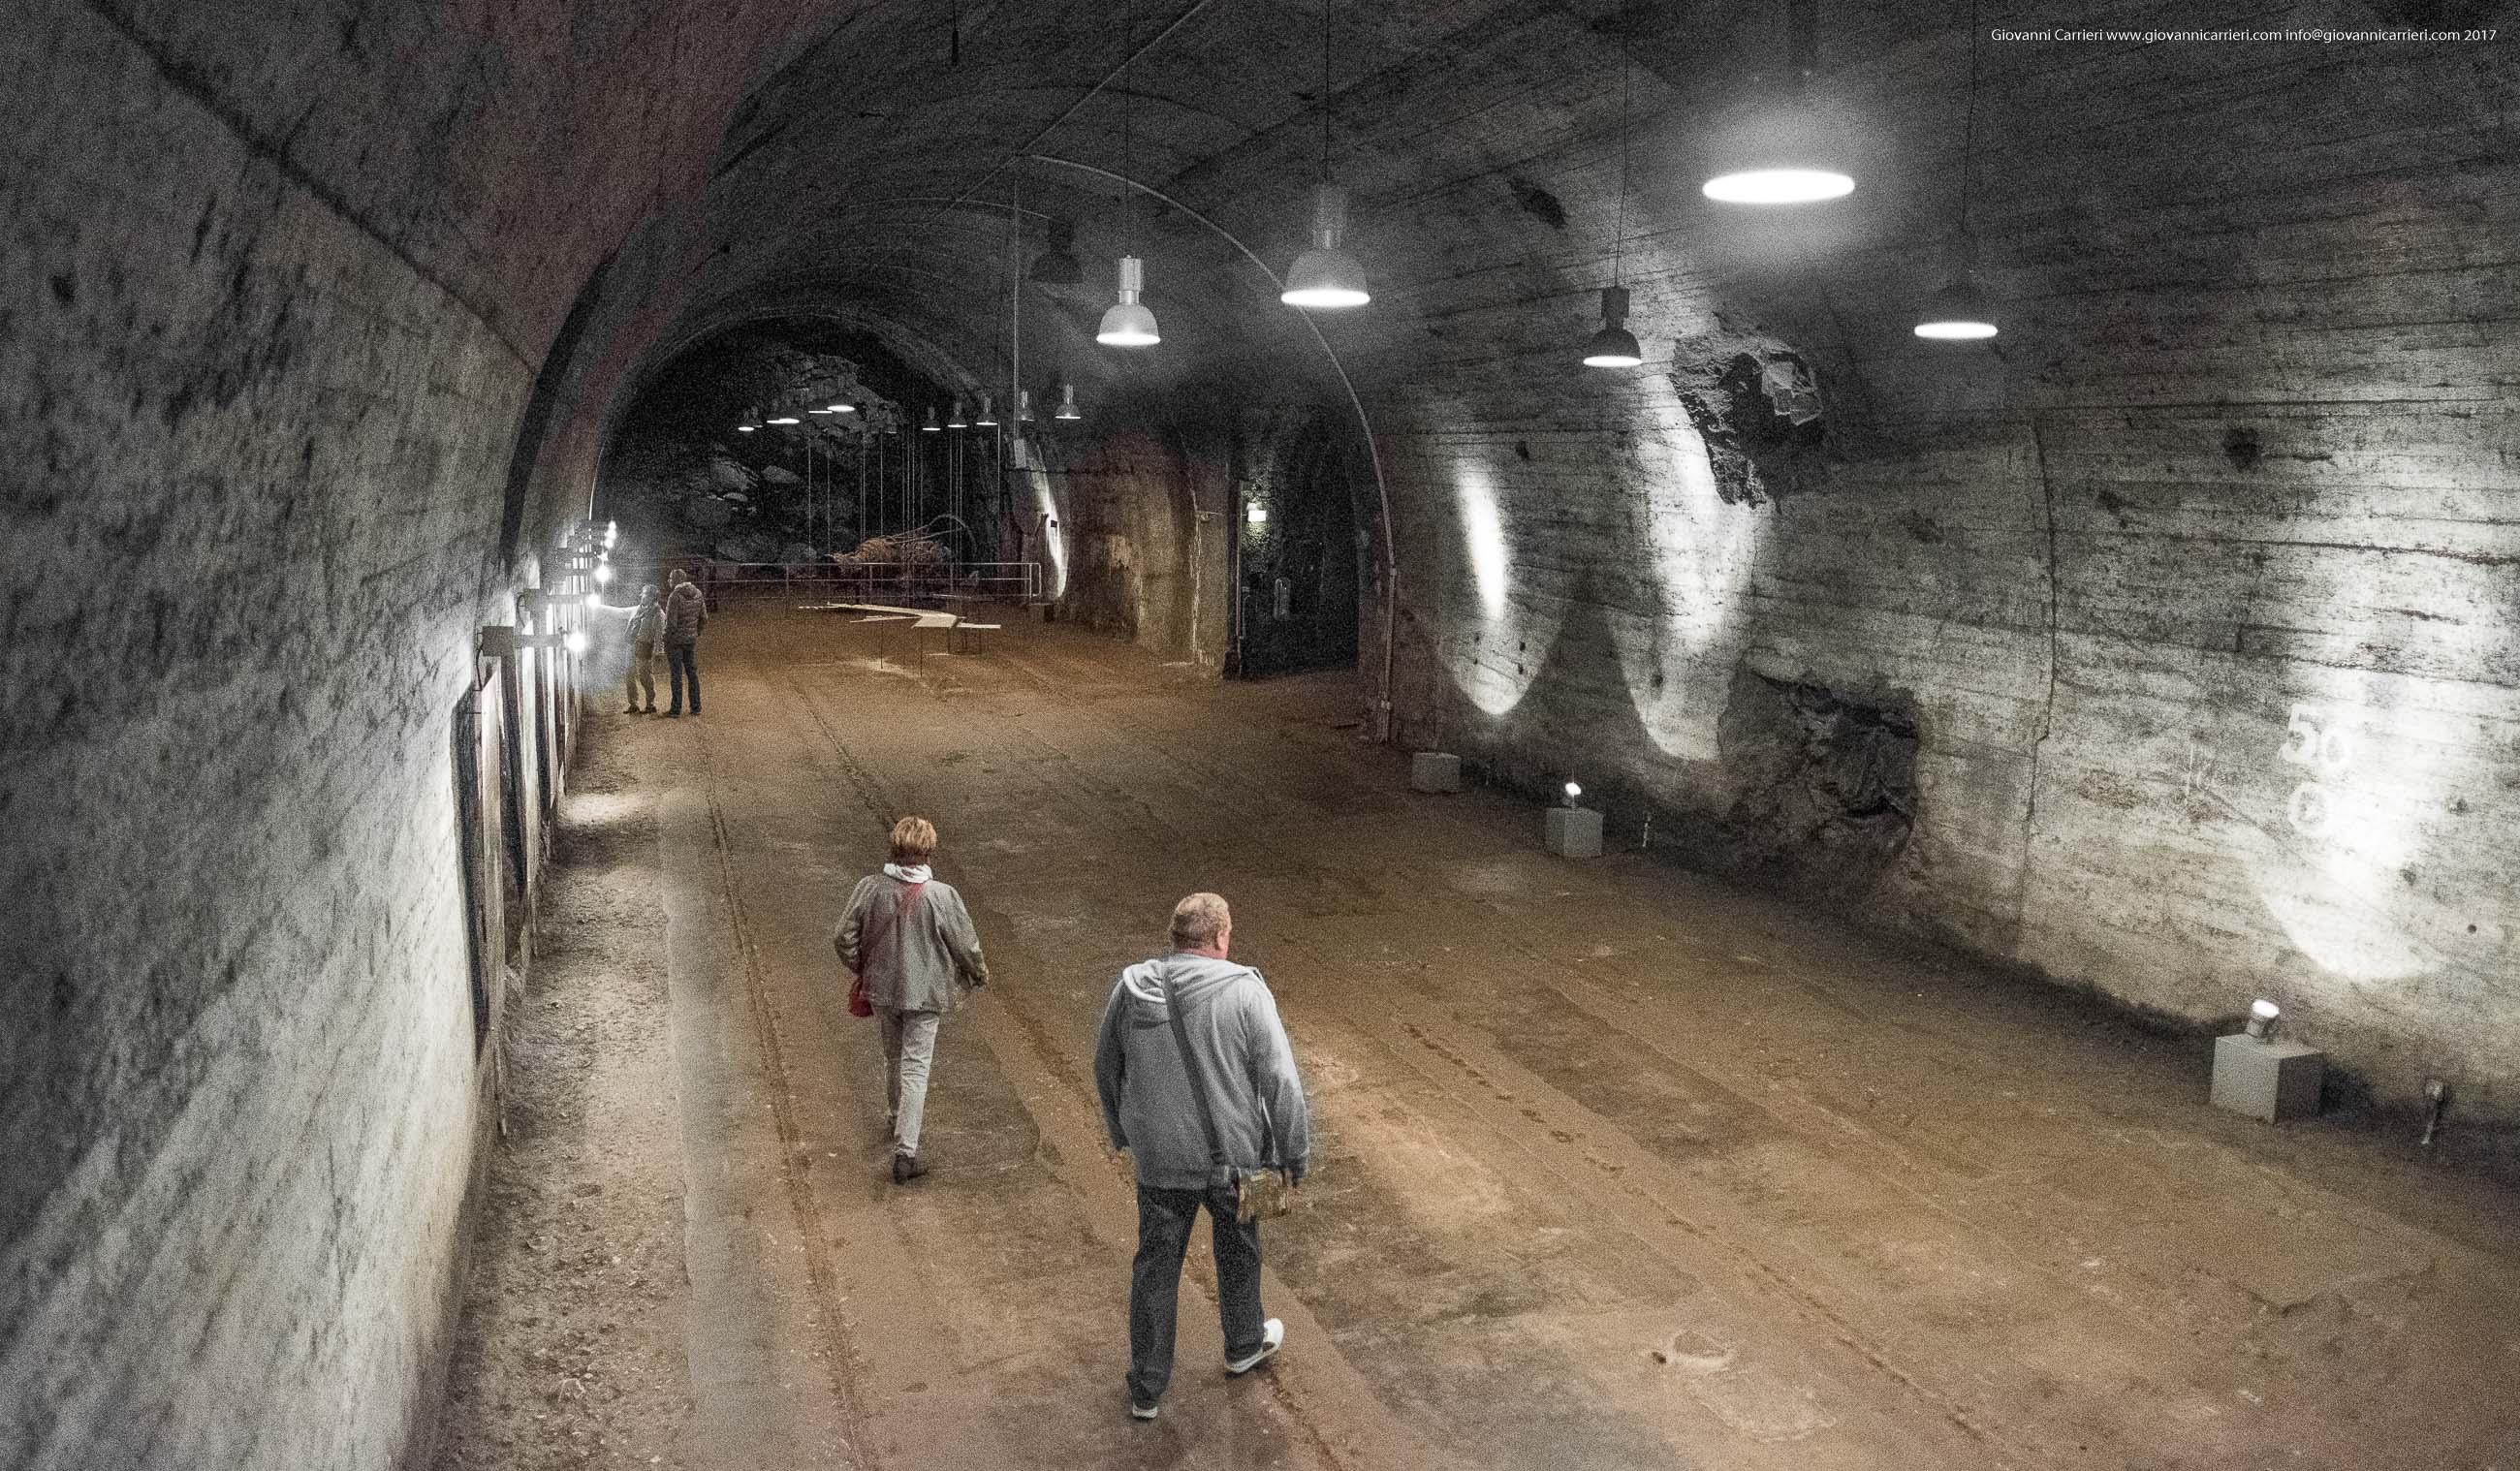 I corridoi sotterranei della fabbrica, Mittelbau-Dora